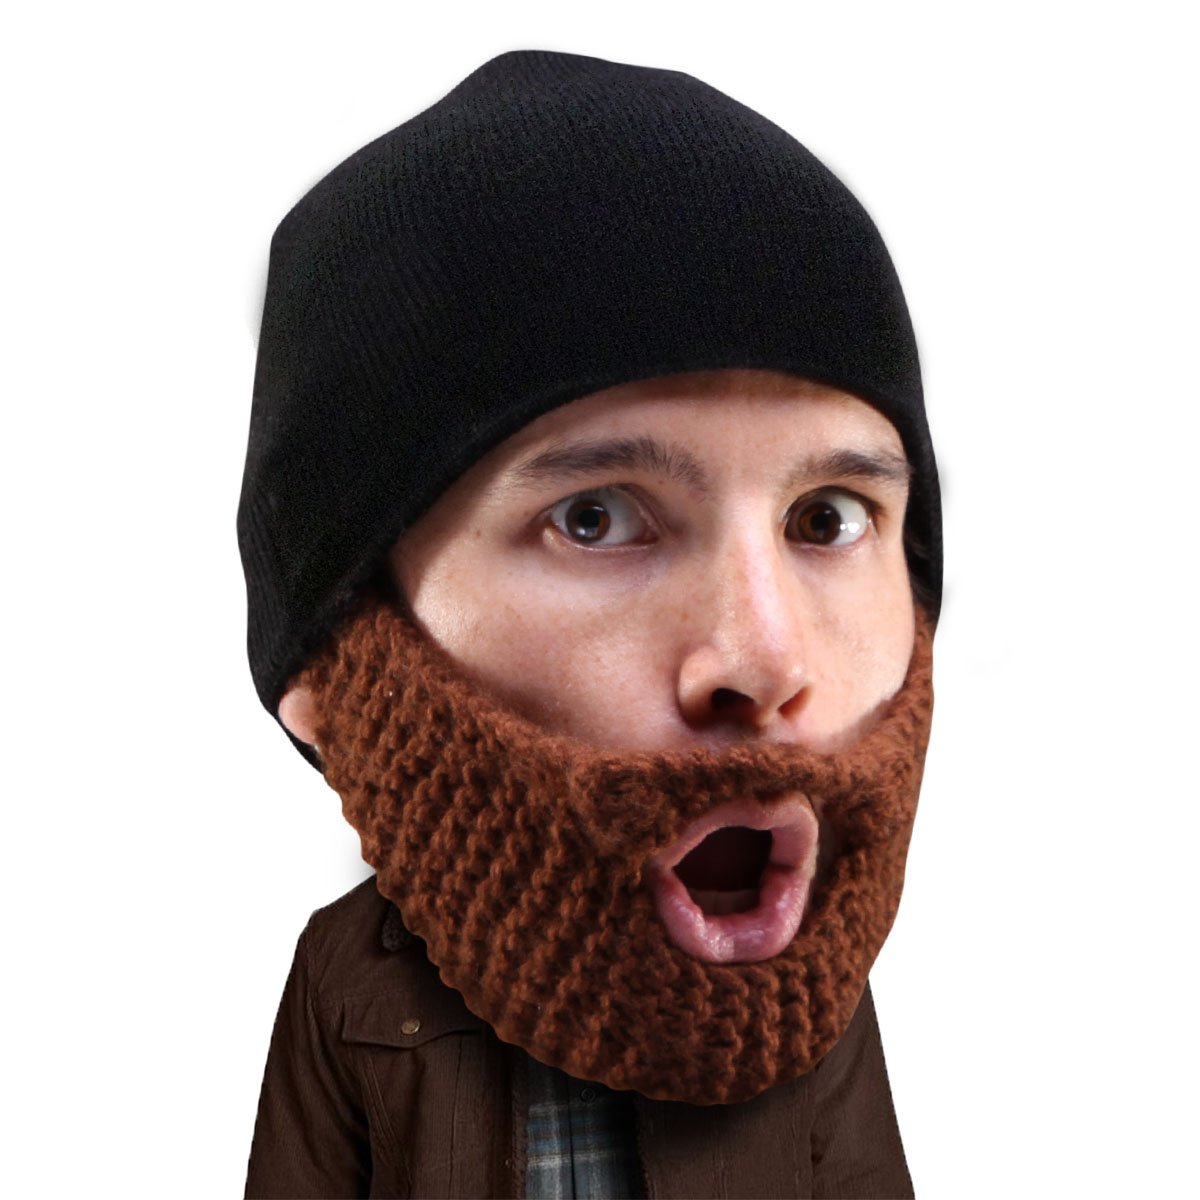 b74c0553c17b9 Amazon.com  Beard Head Stubble Populous Beard Beanie -Funny Knit Hat and  Fake Beard Facemask Brown  Clothing